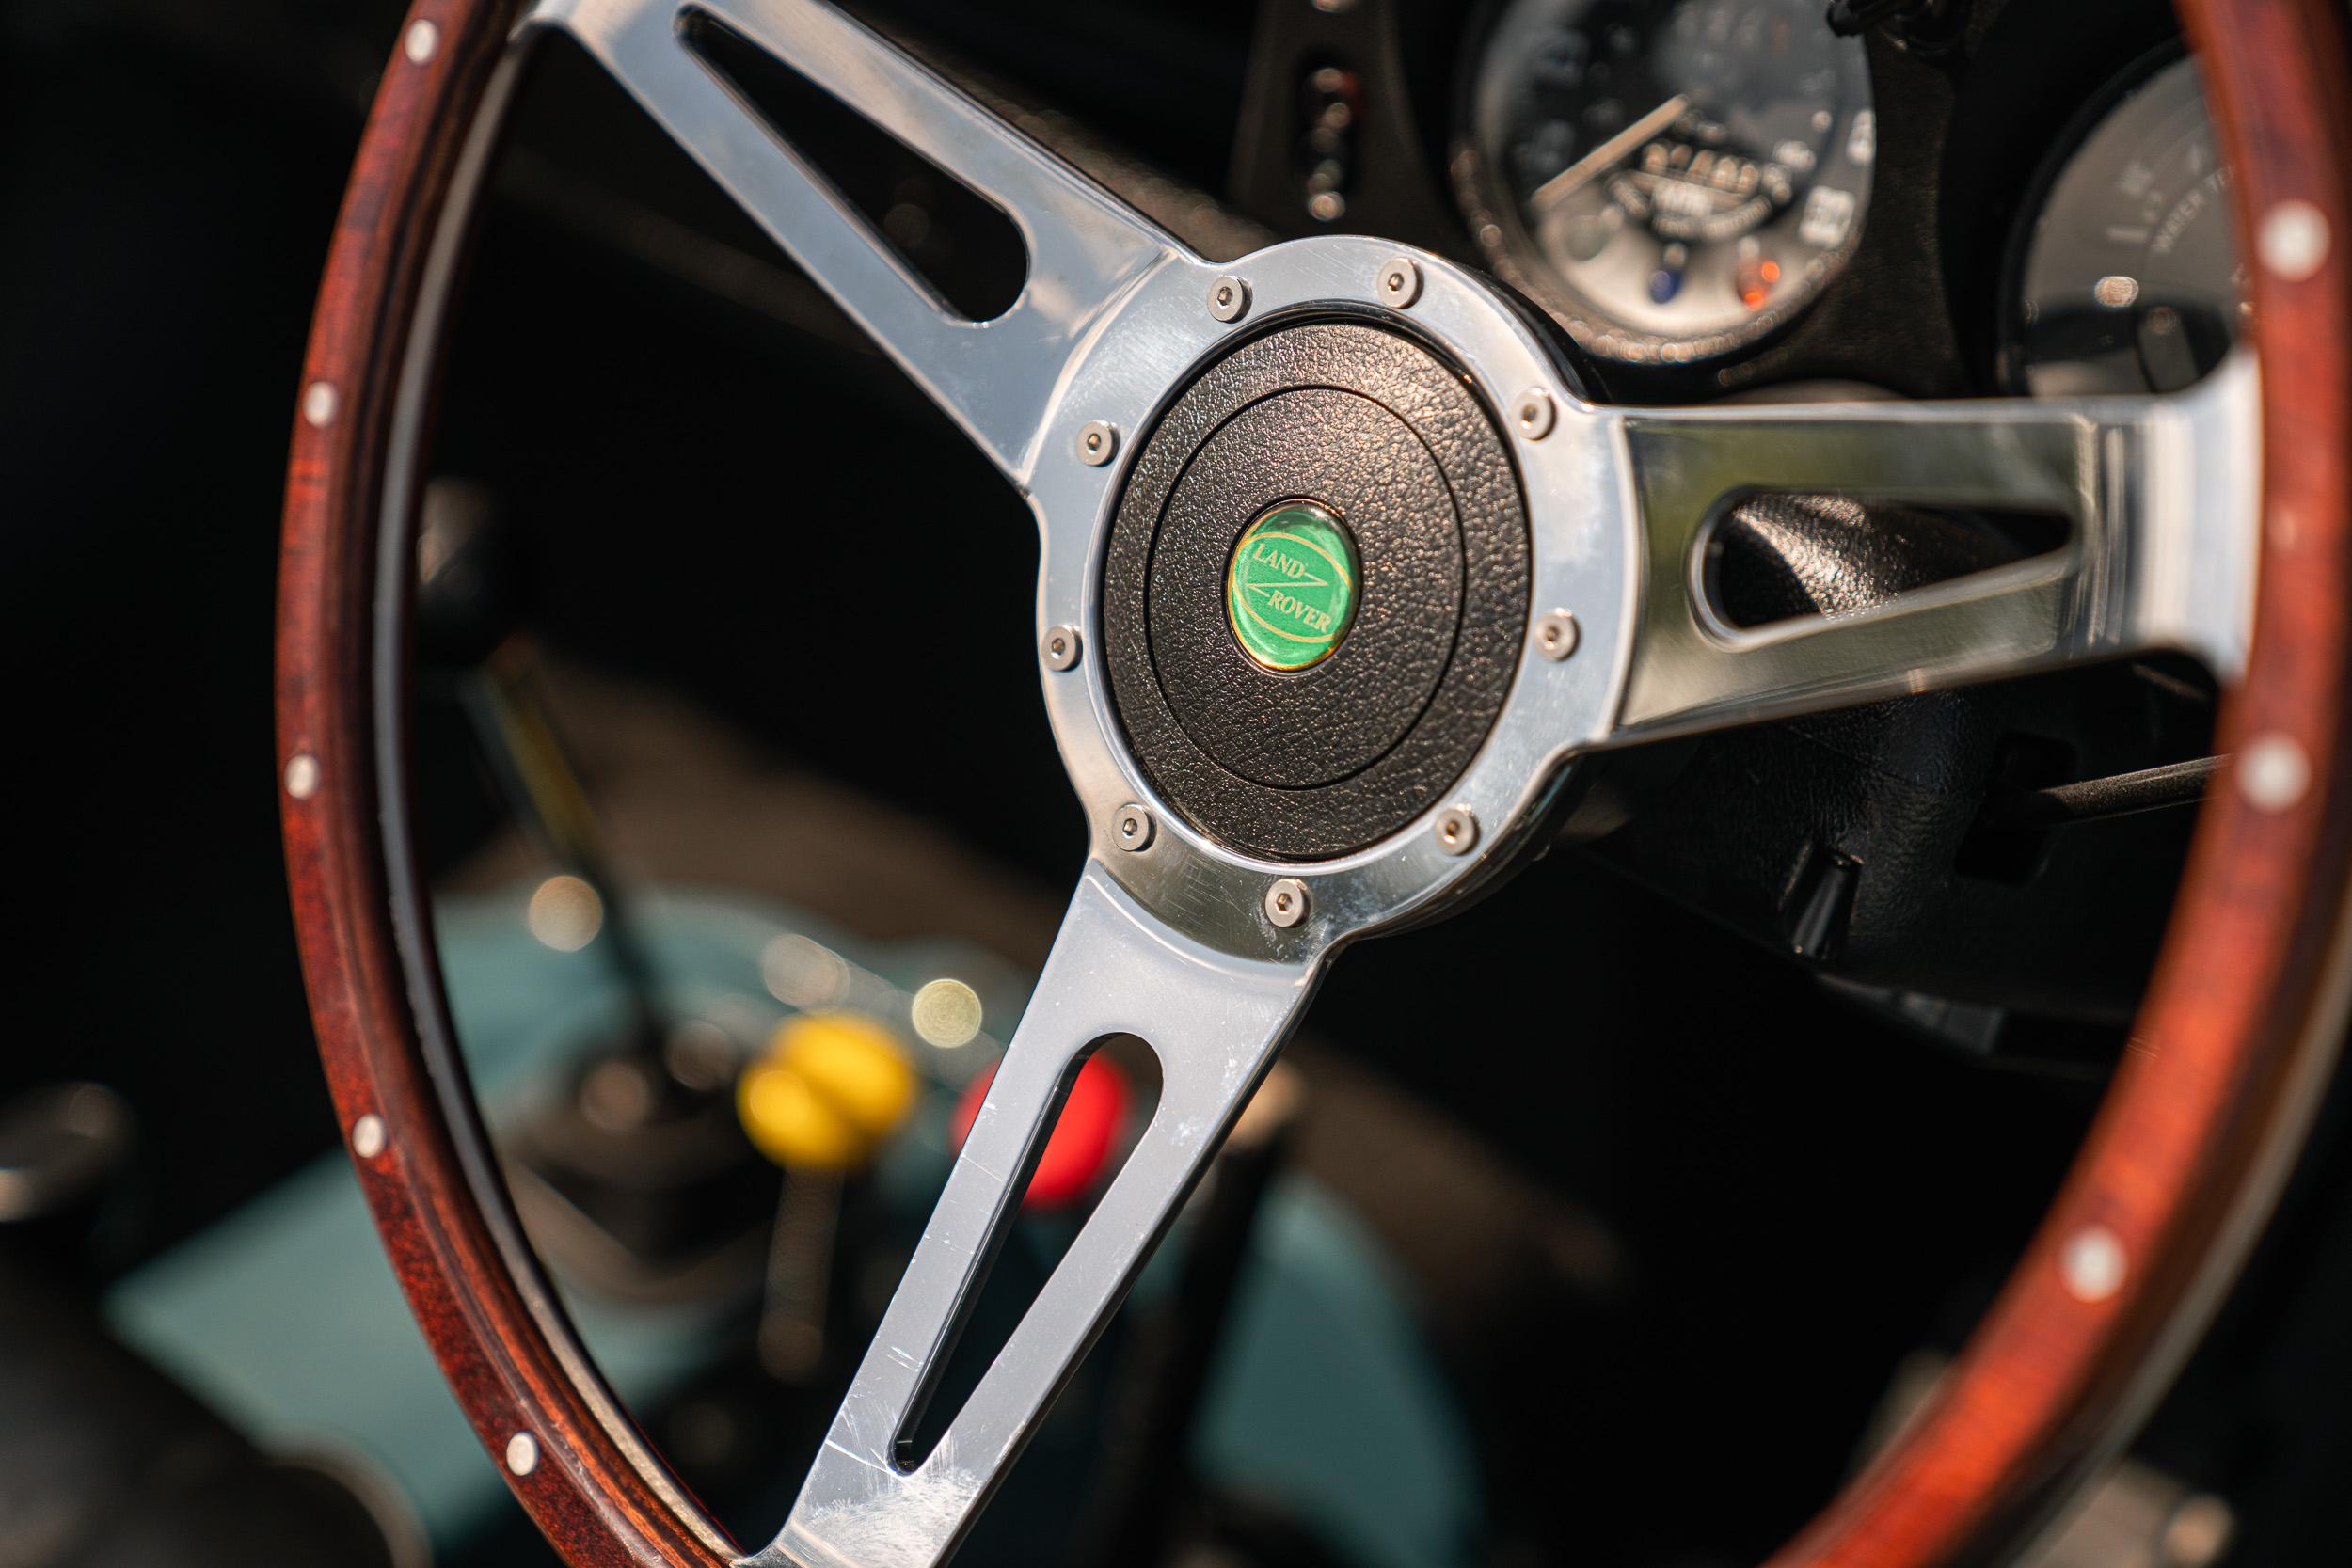 1982 Land Rover interior steering wheel